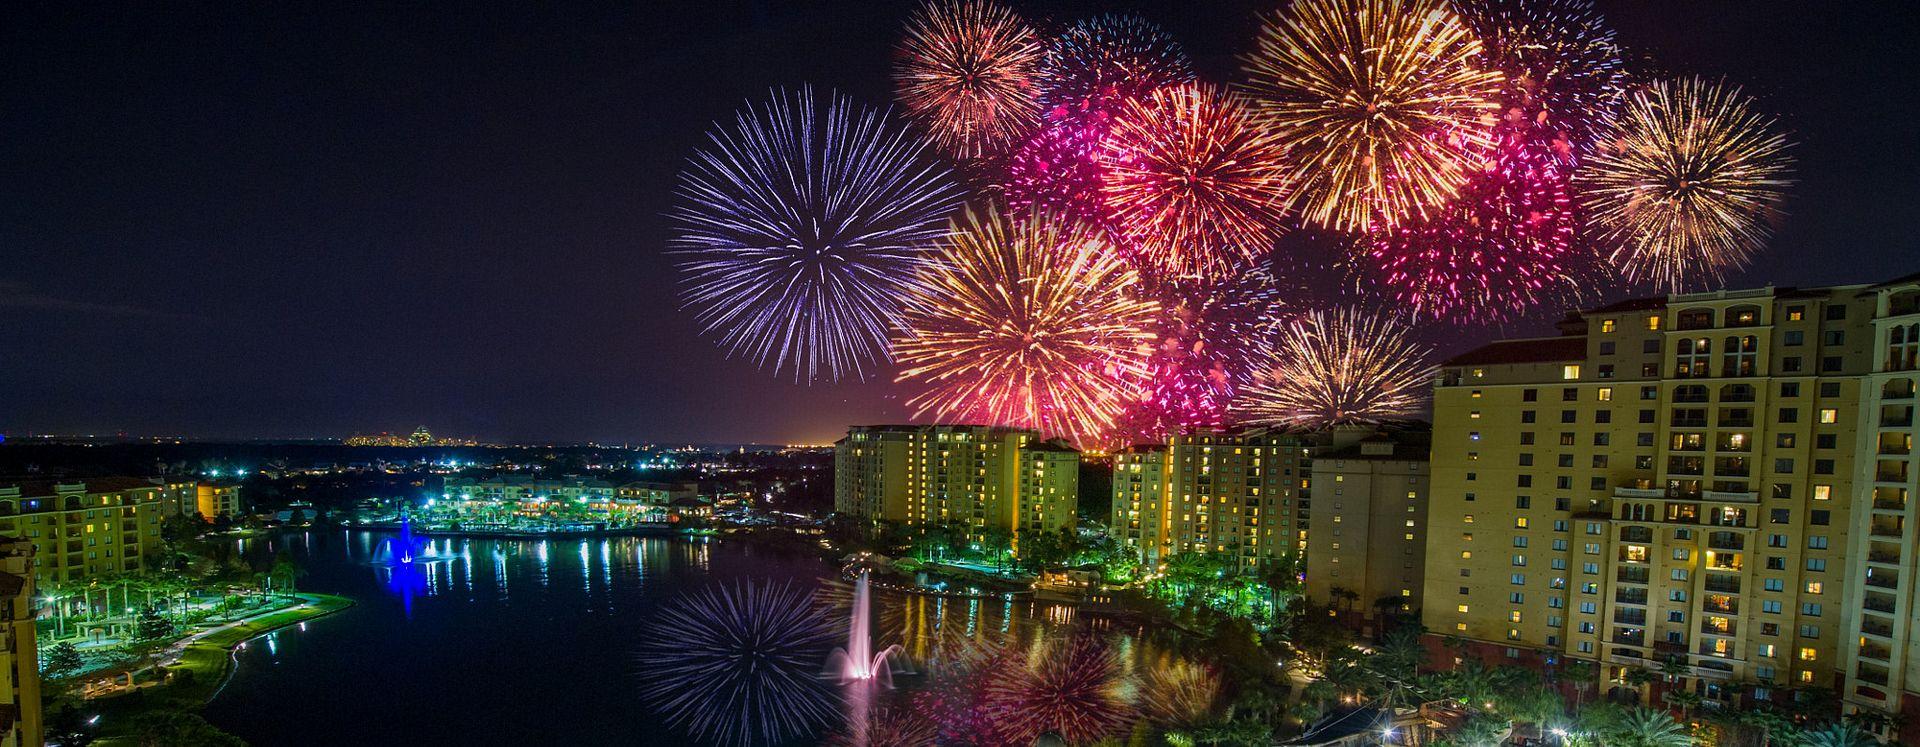 Wyndham Grand Orlando Resort Bonnet Creek fireworks at night